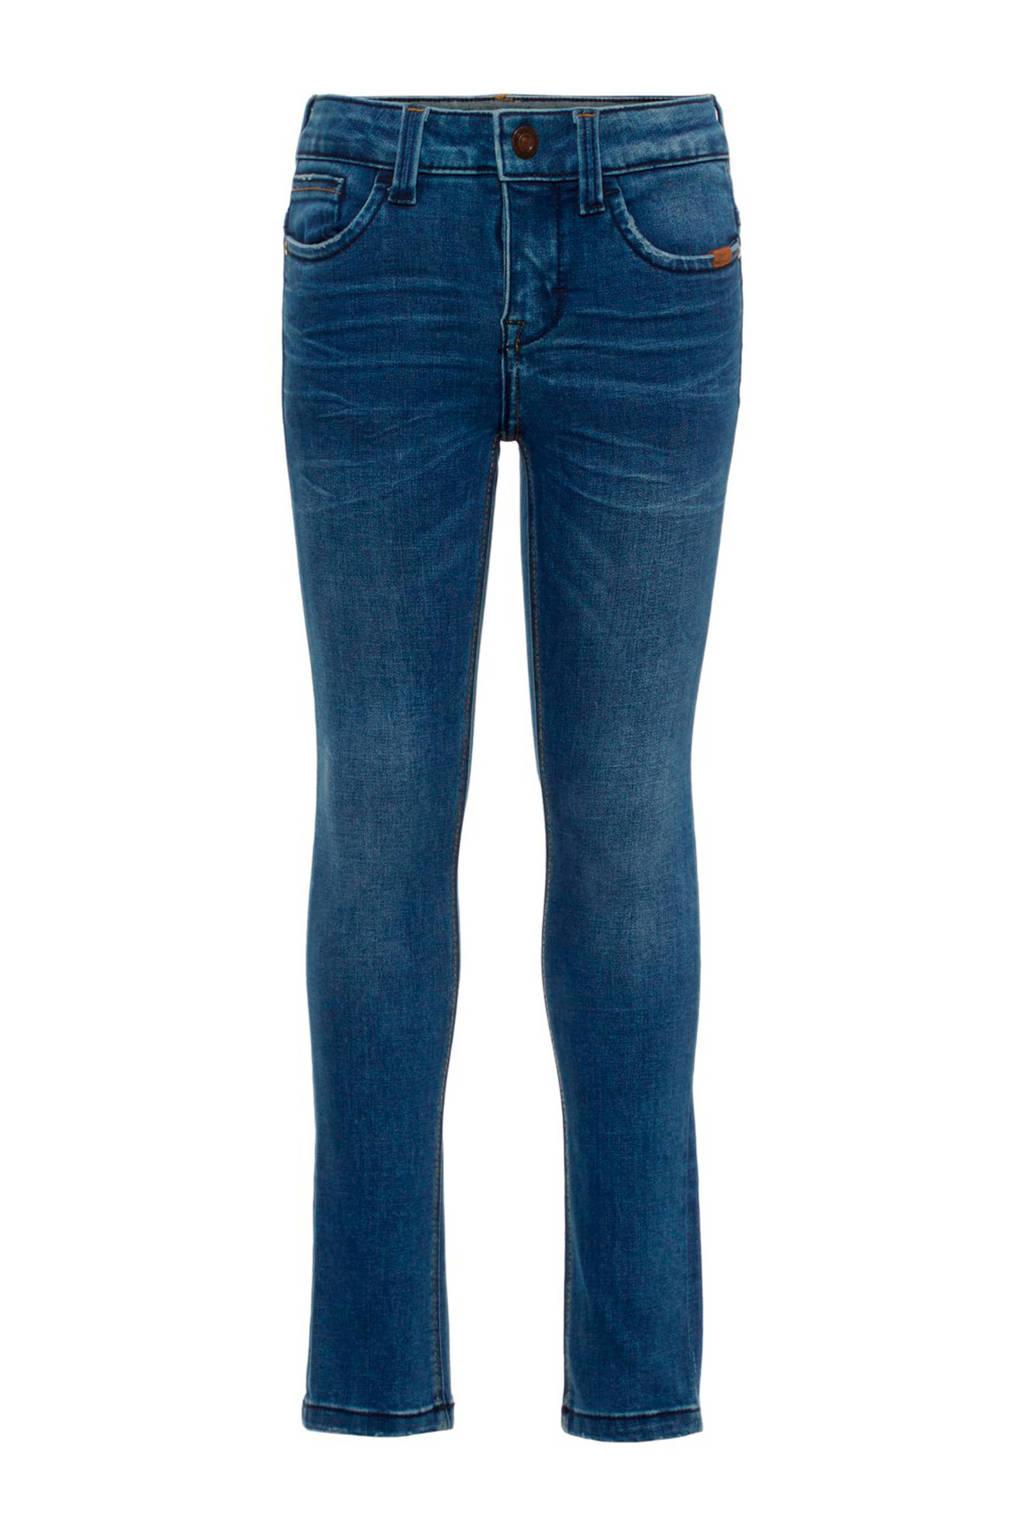 NAME IT KIDS skinny fit jeans Pete, Dark blue denim